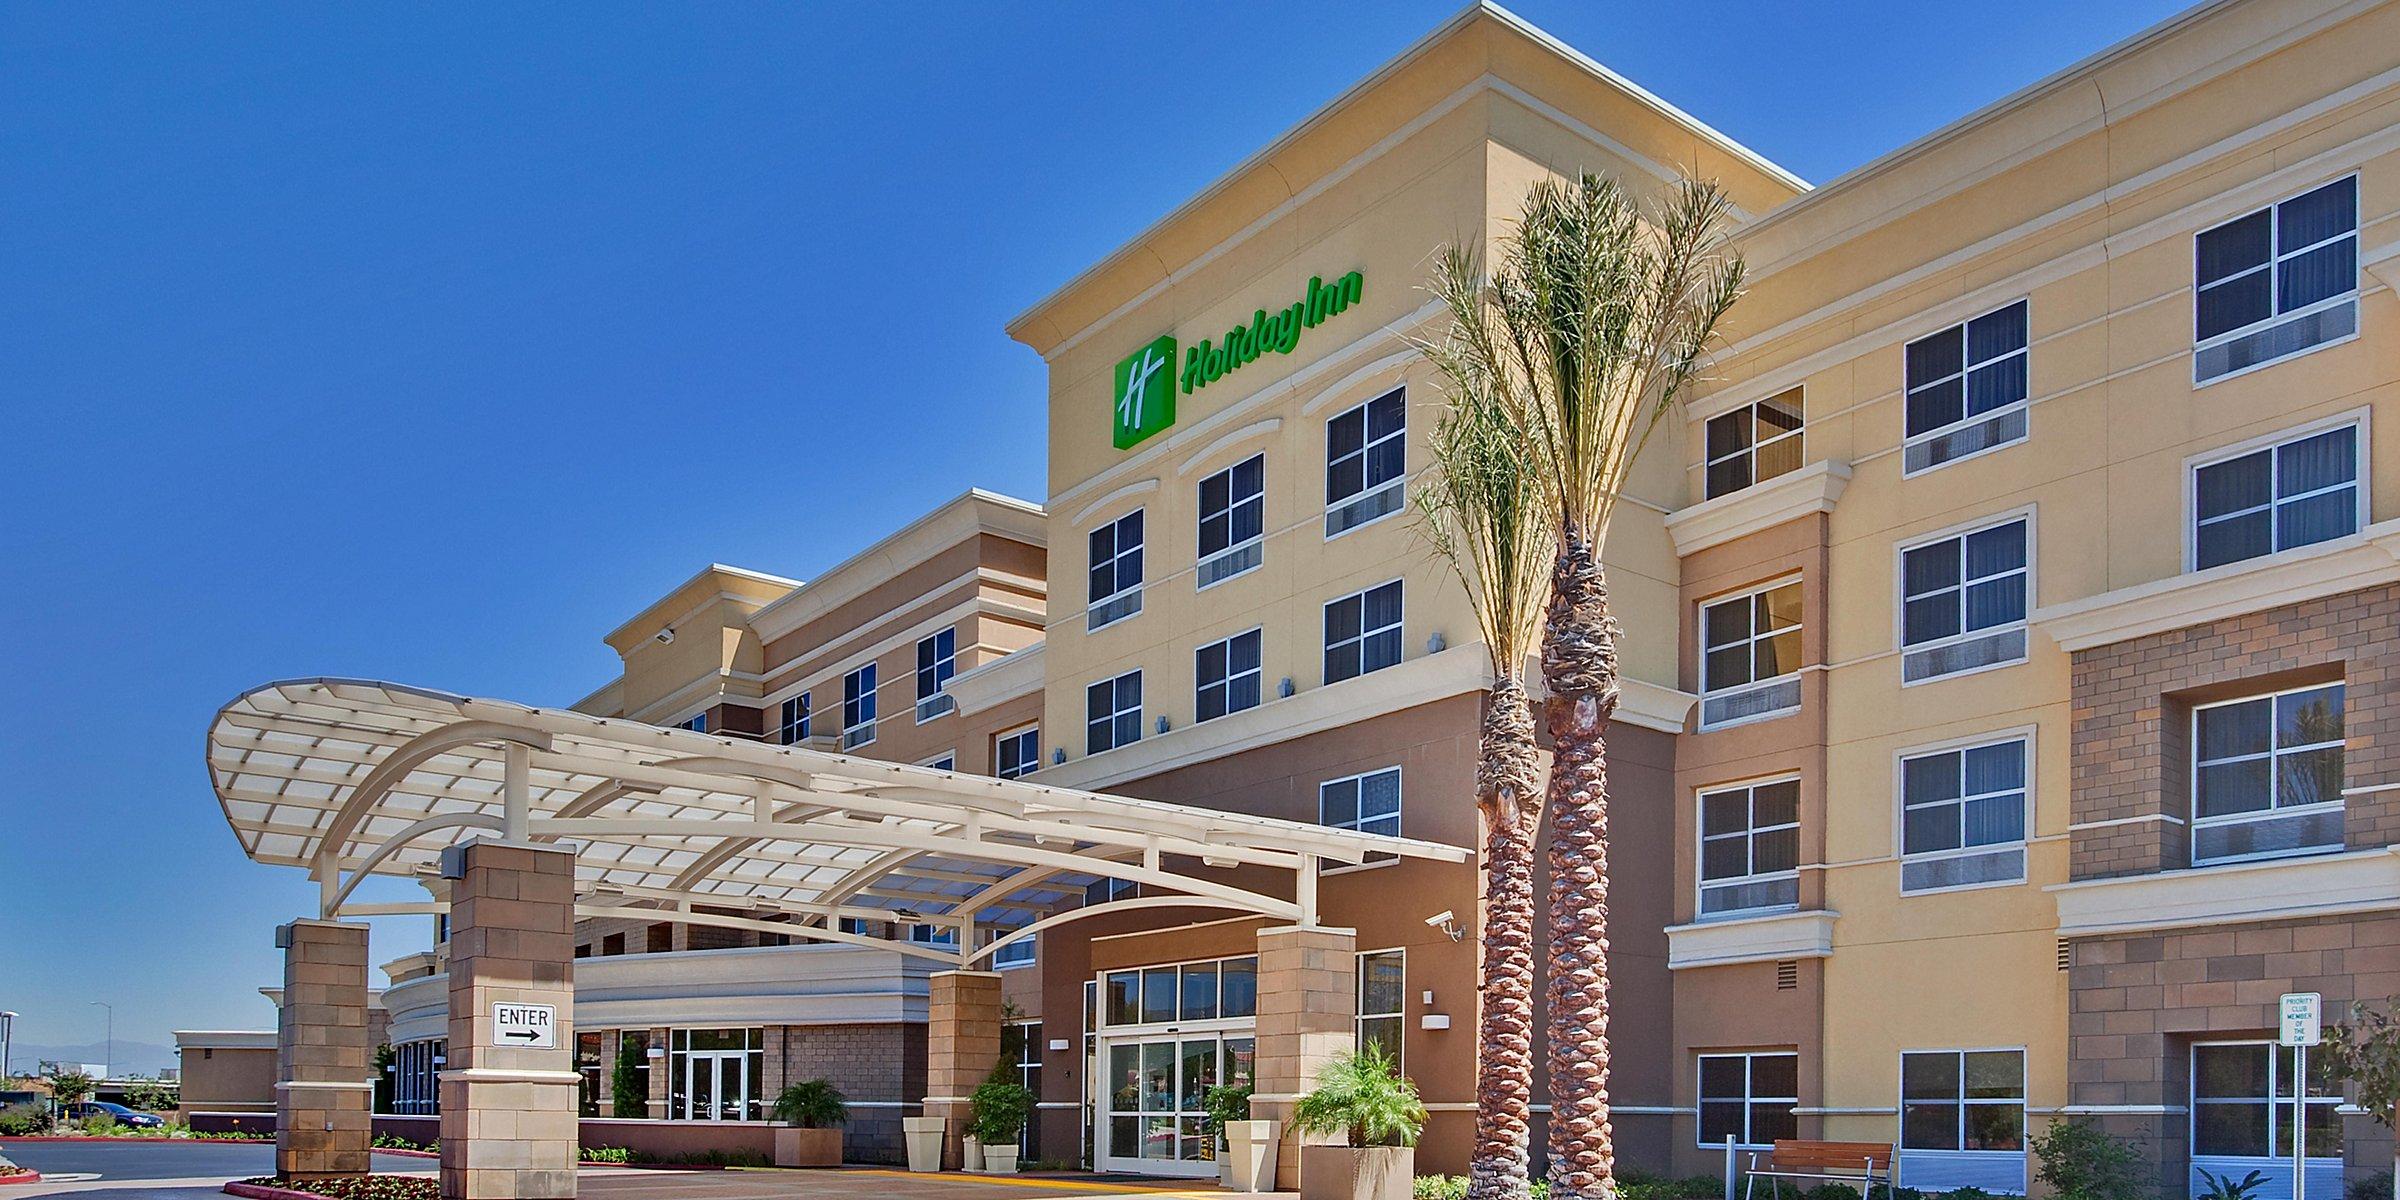 Ontario, CA Hotels near Ontario Airport | Holiday Inn